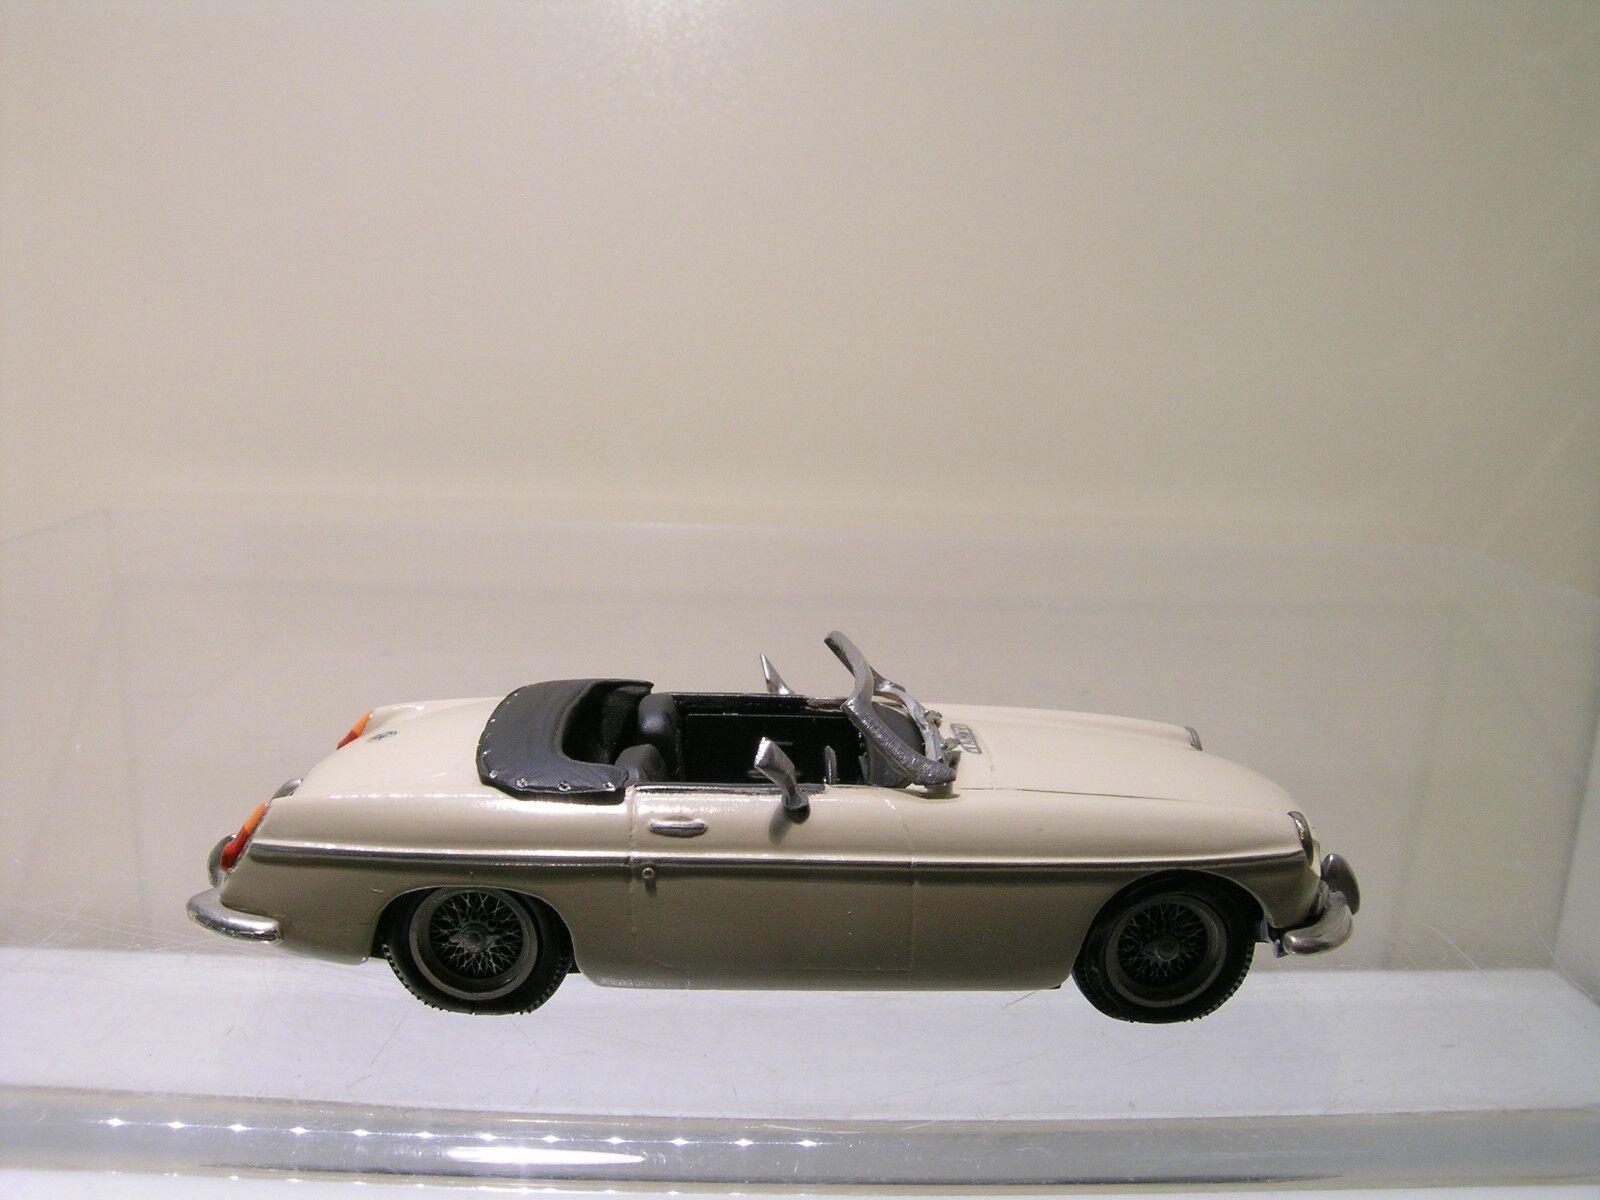 TOP MARQUES modelloS MGB MG B stradaSTER 1965 CREAM CREAM CREAM  bianca-METAL HeBUILT 1 43 222b2b